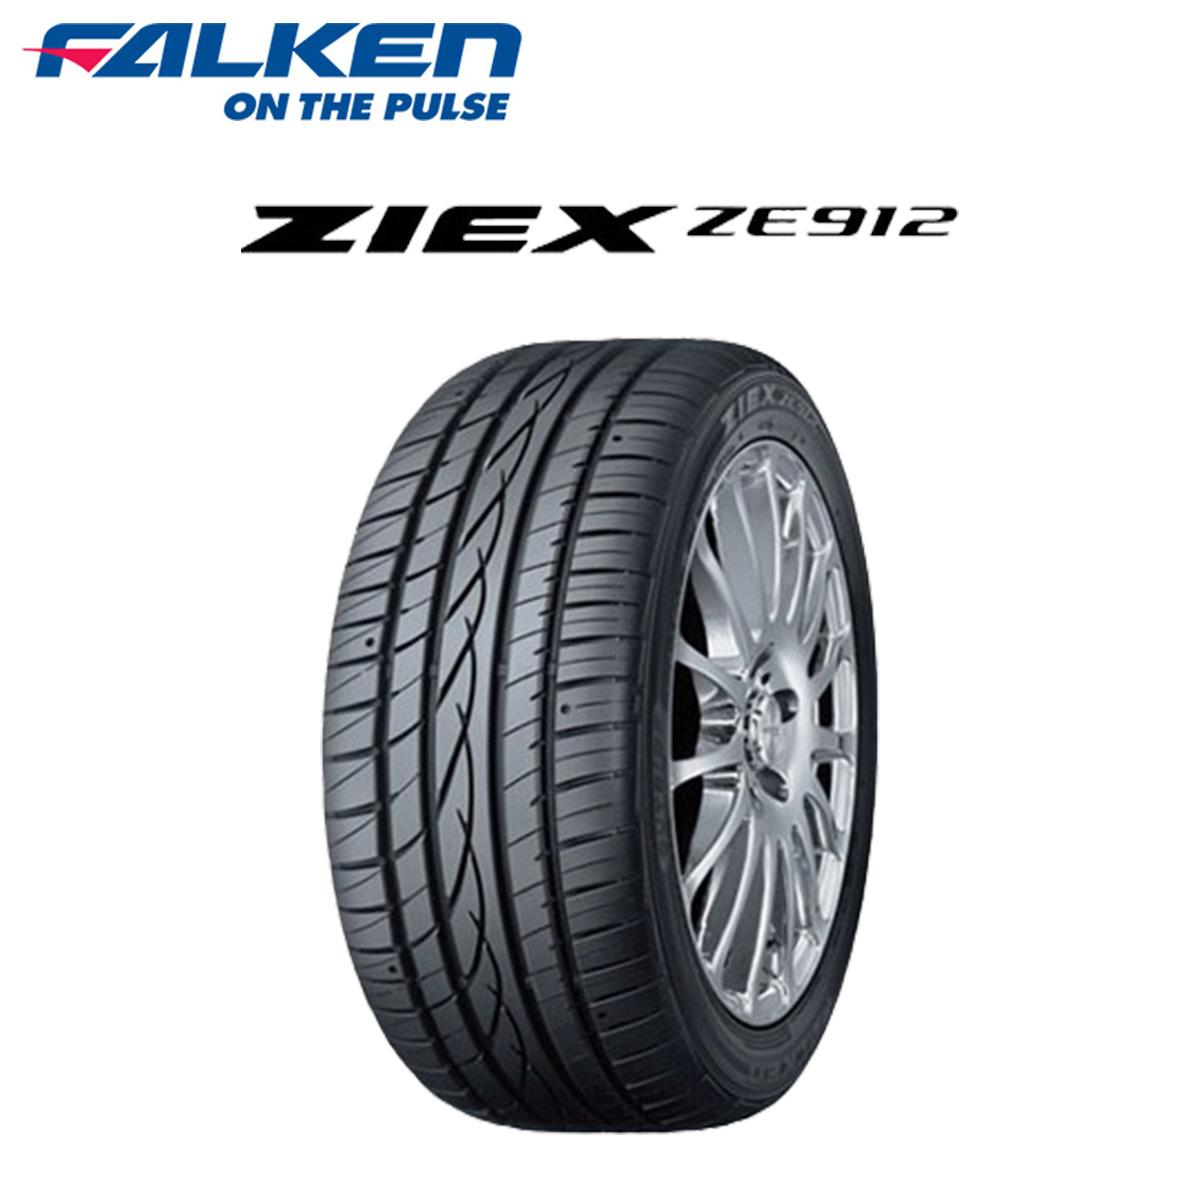 FALKENファンケル低燃費サマータイヤ2本19インチ245/35R19ZIEXZE912ジークス